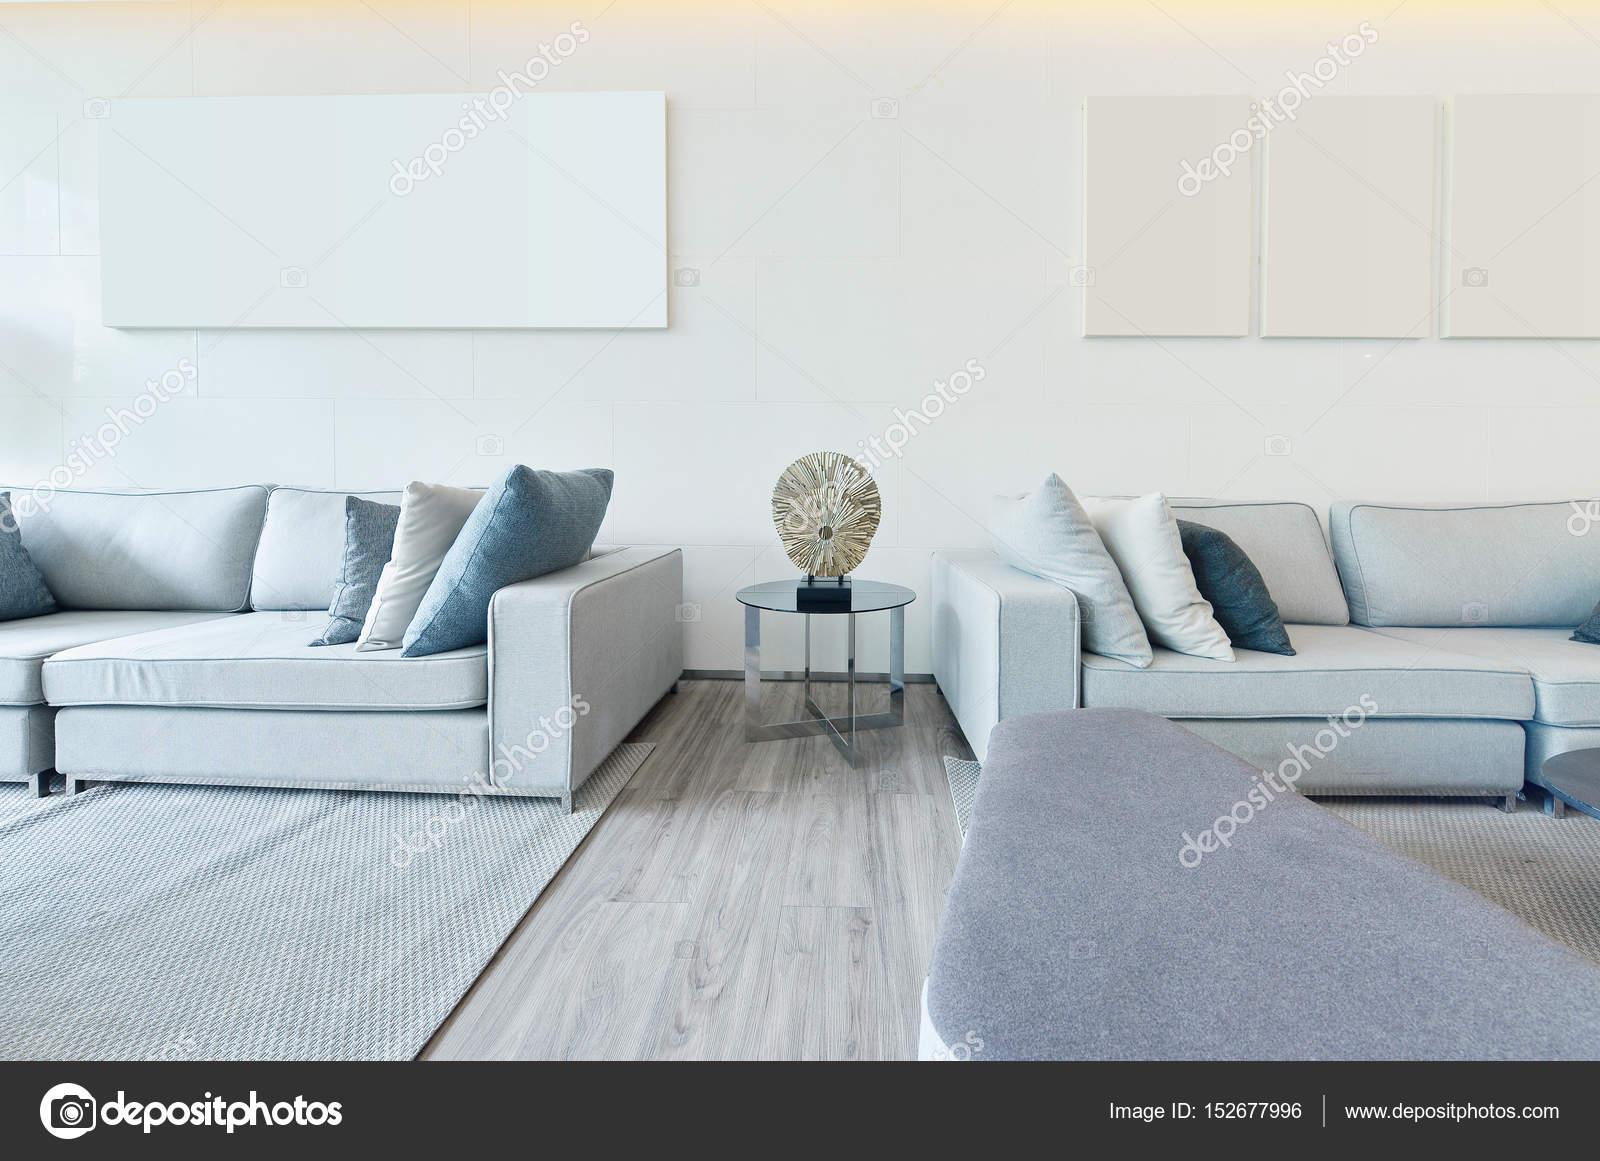 Erfreut Modernes Wohn Interieur Fotos - Images for inspirierende ...